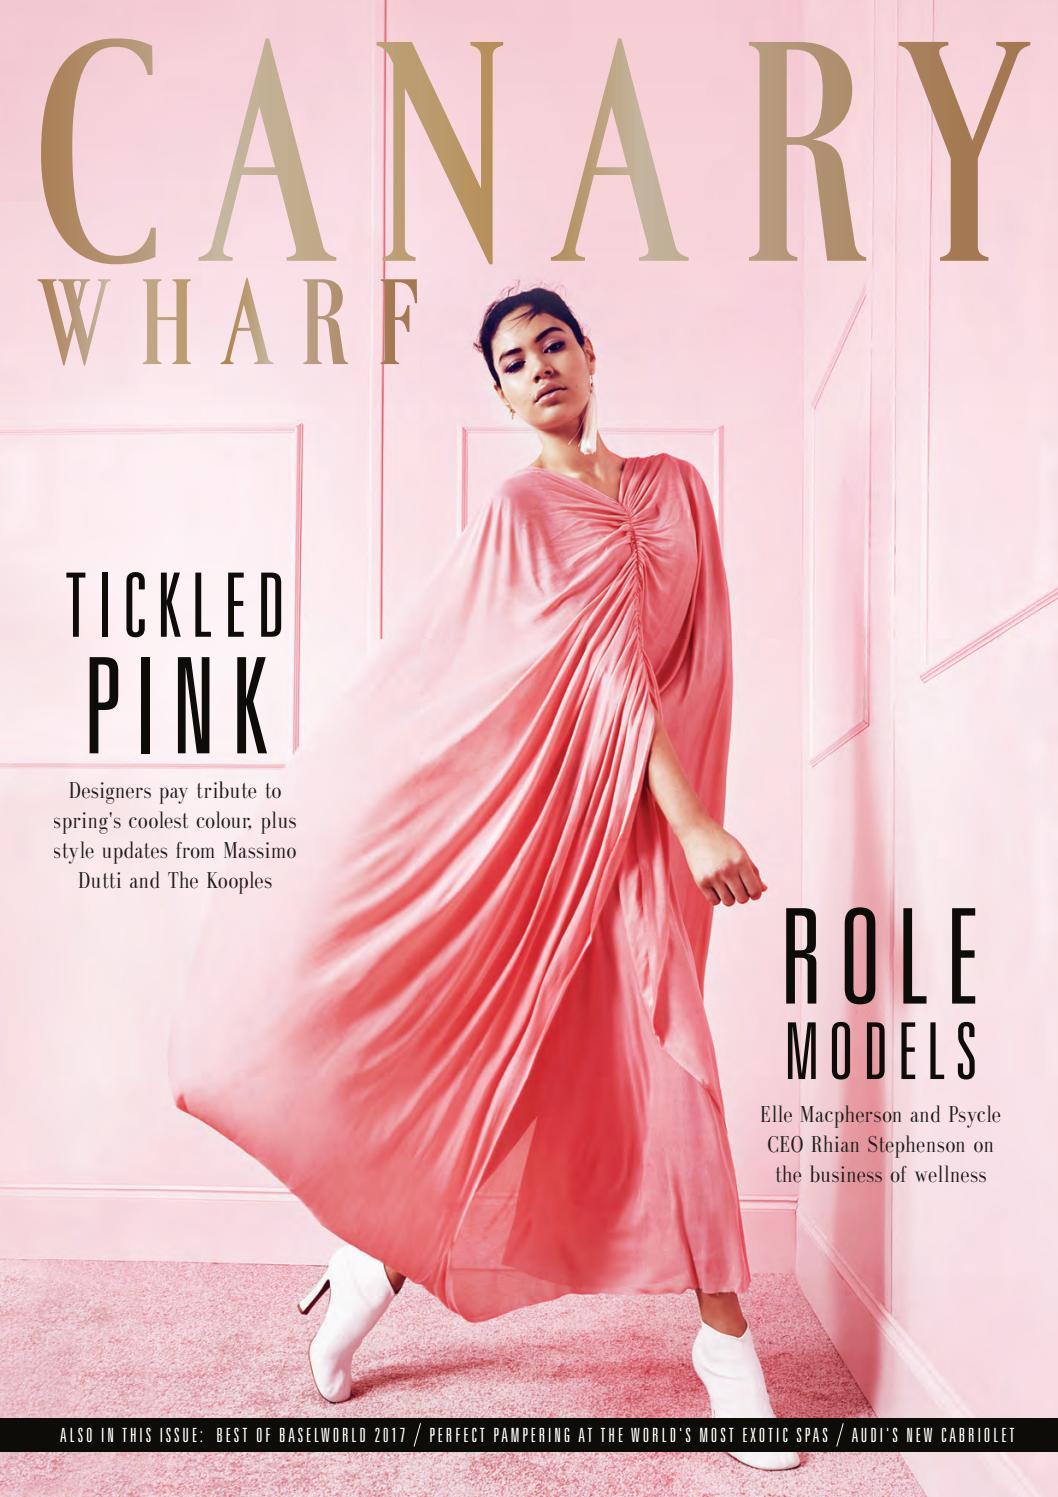 d9bfc199a36f Canary Wharf Magazine October 2016 by Runwild Media Group - issuu